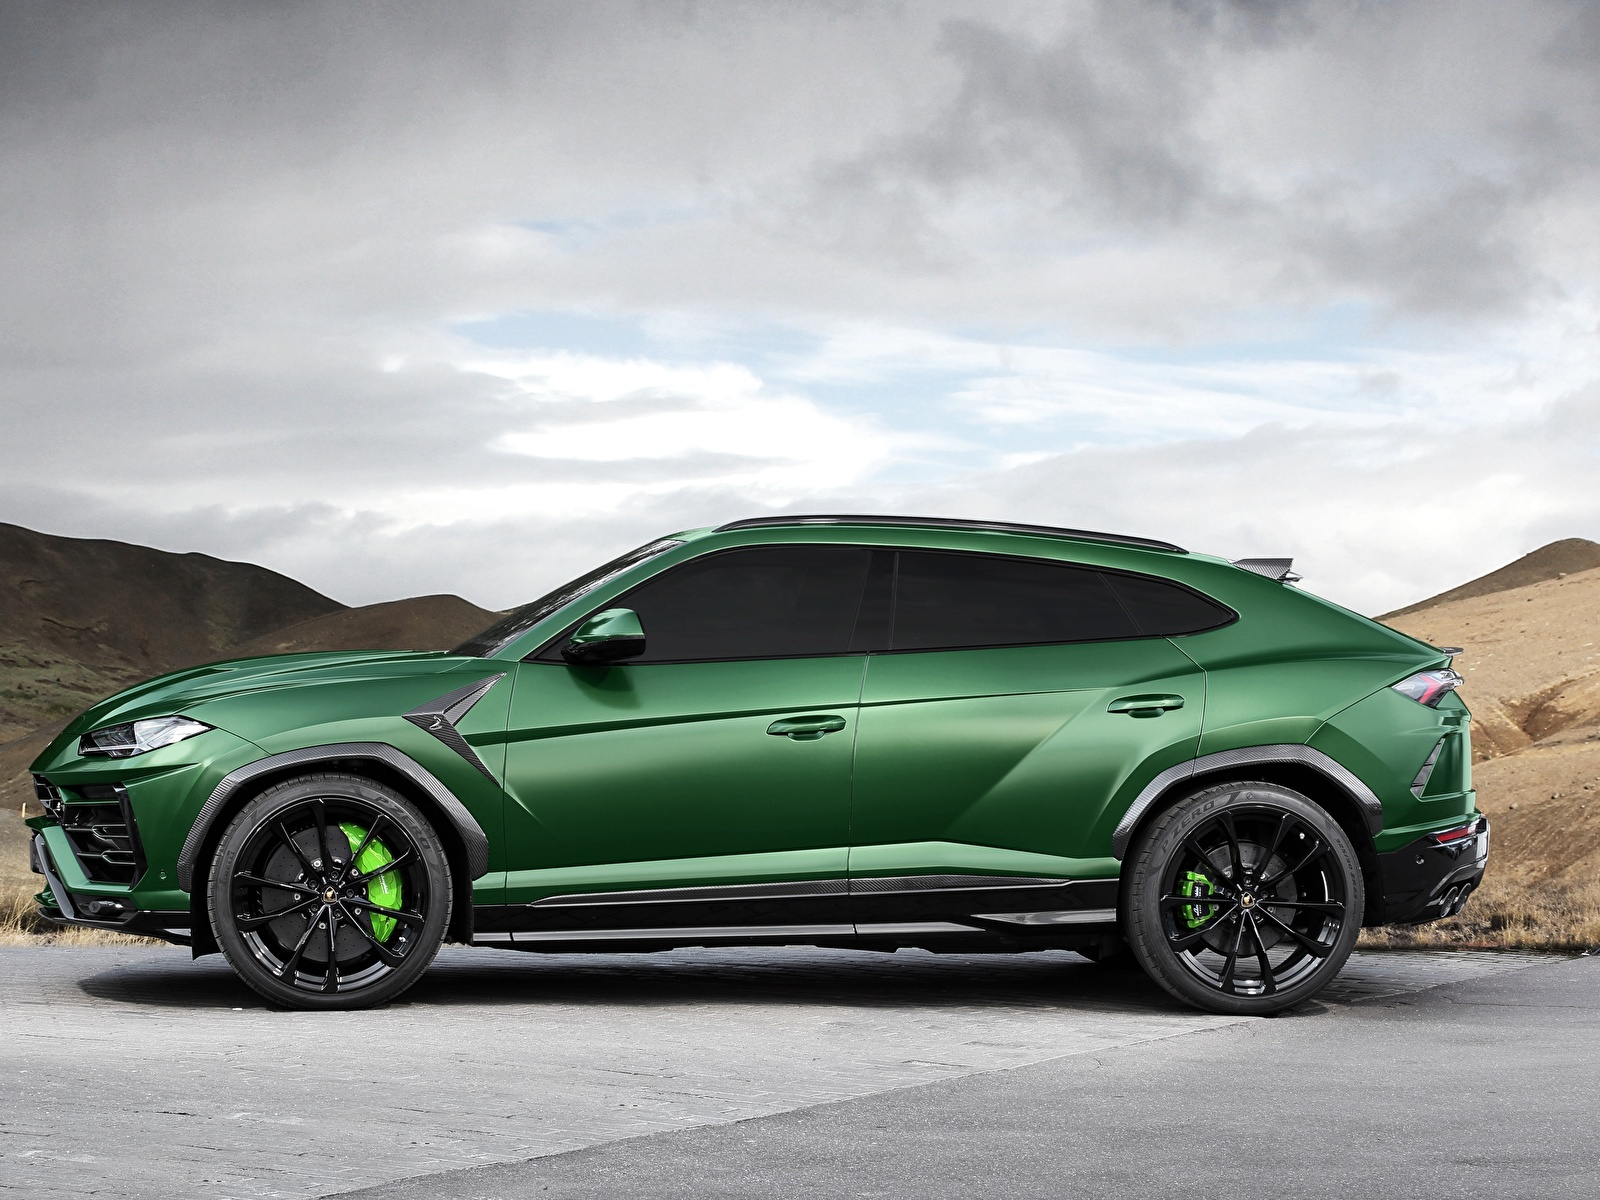 Hintergrundbilder Lamborghini 2018 TopCar Urus Grün Autos Seitlich 1600x1200 auto automobil